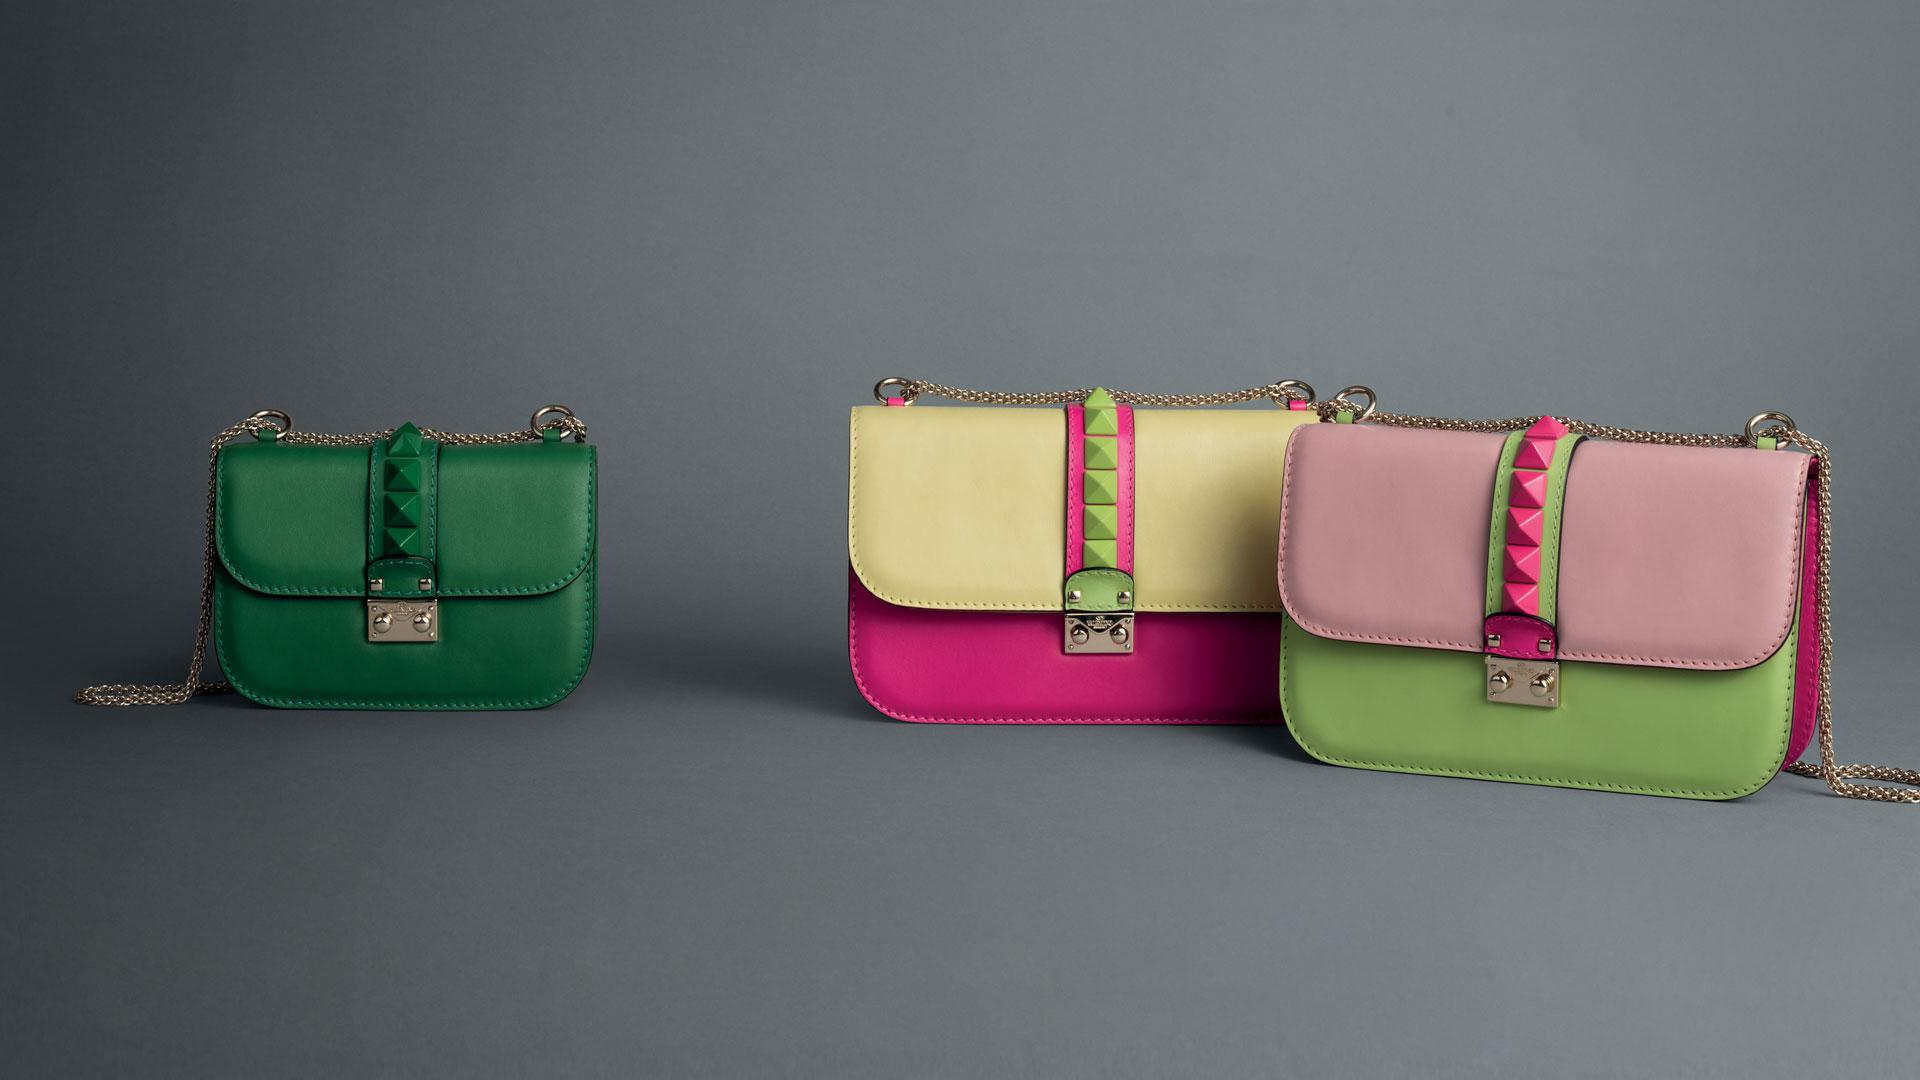 Сумка Valentino Bags by Mario Valentino 24012015